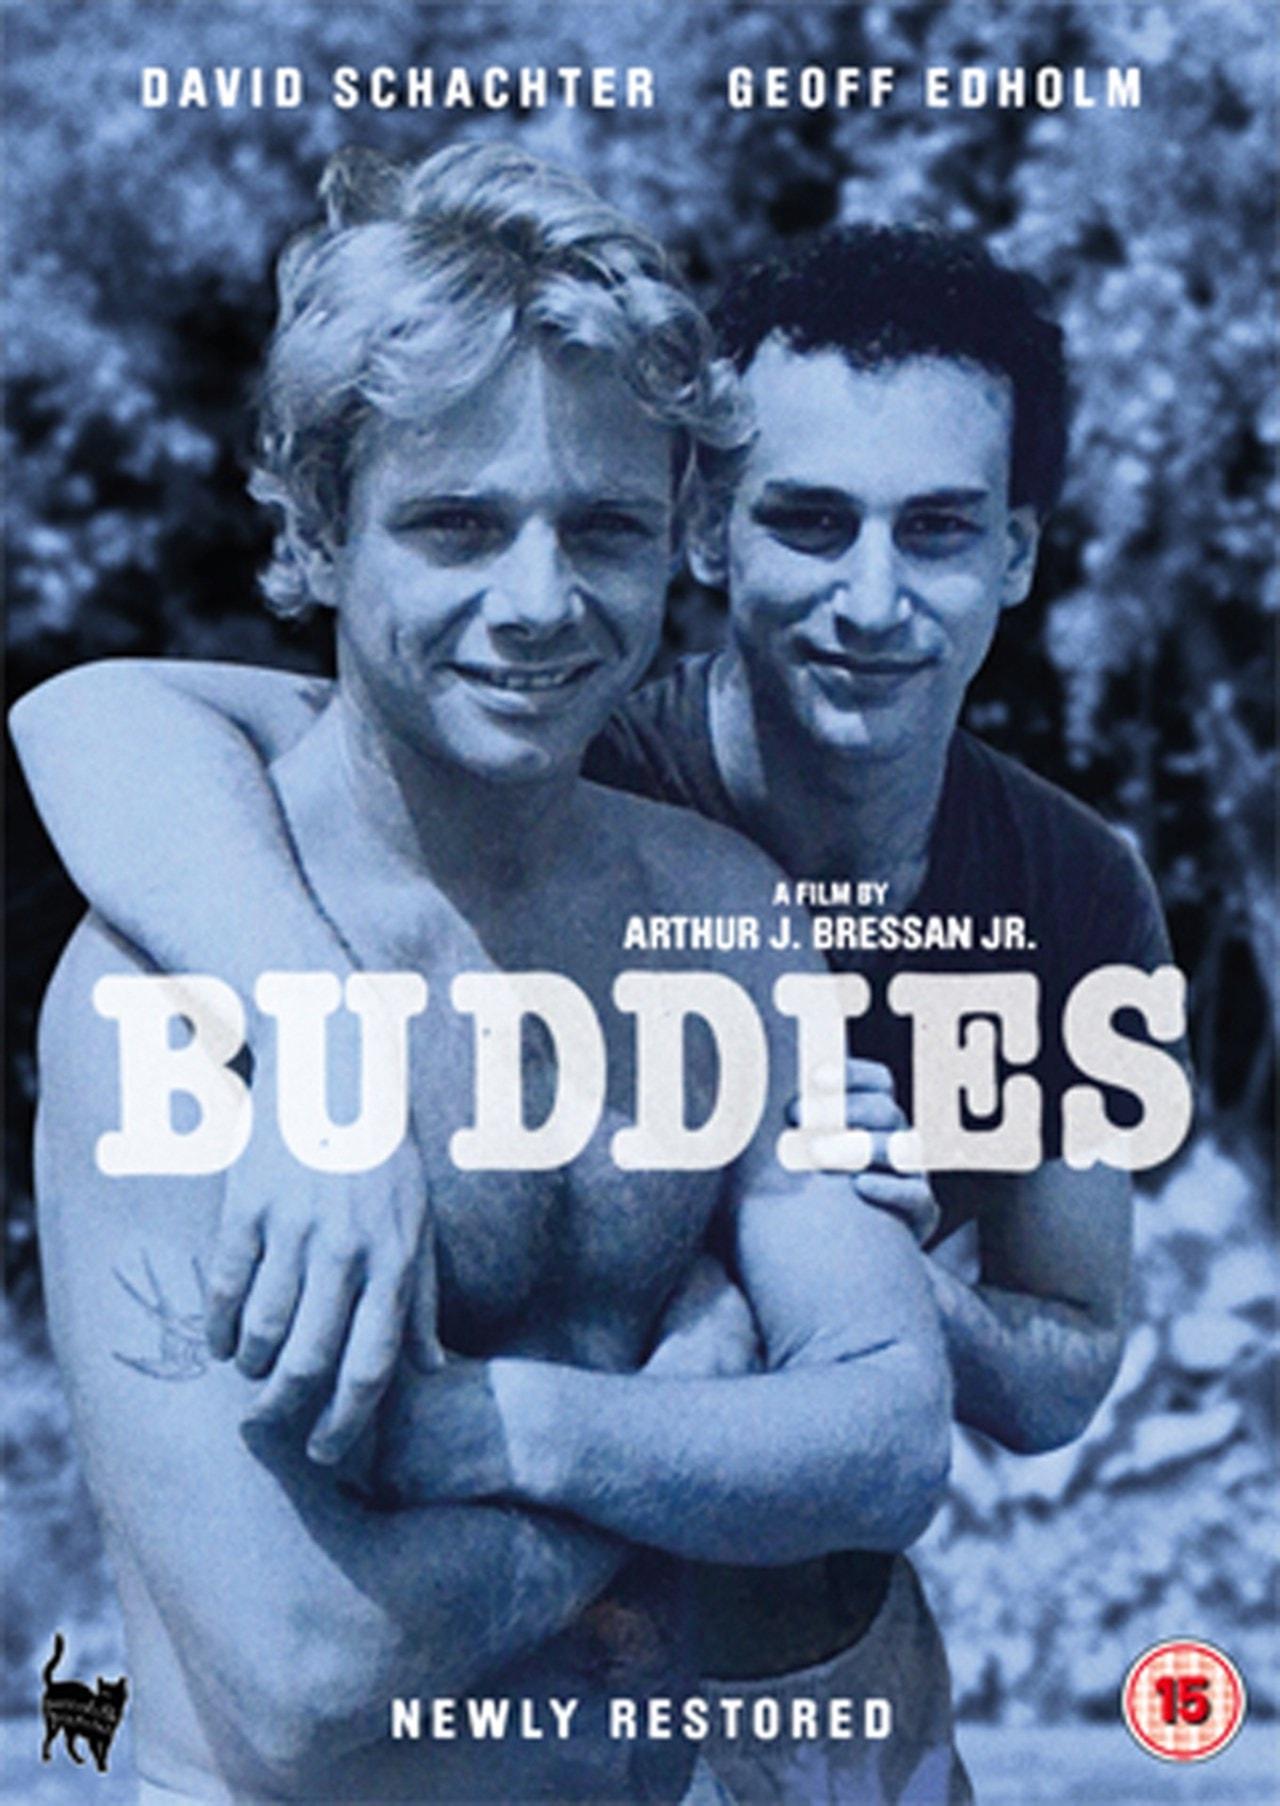 Buddies - 1